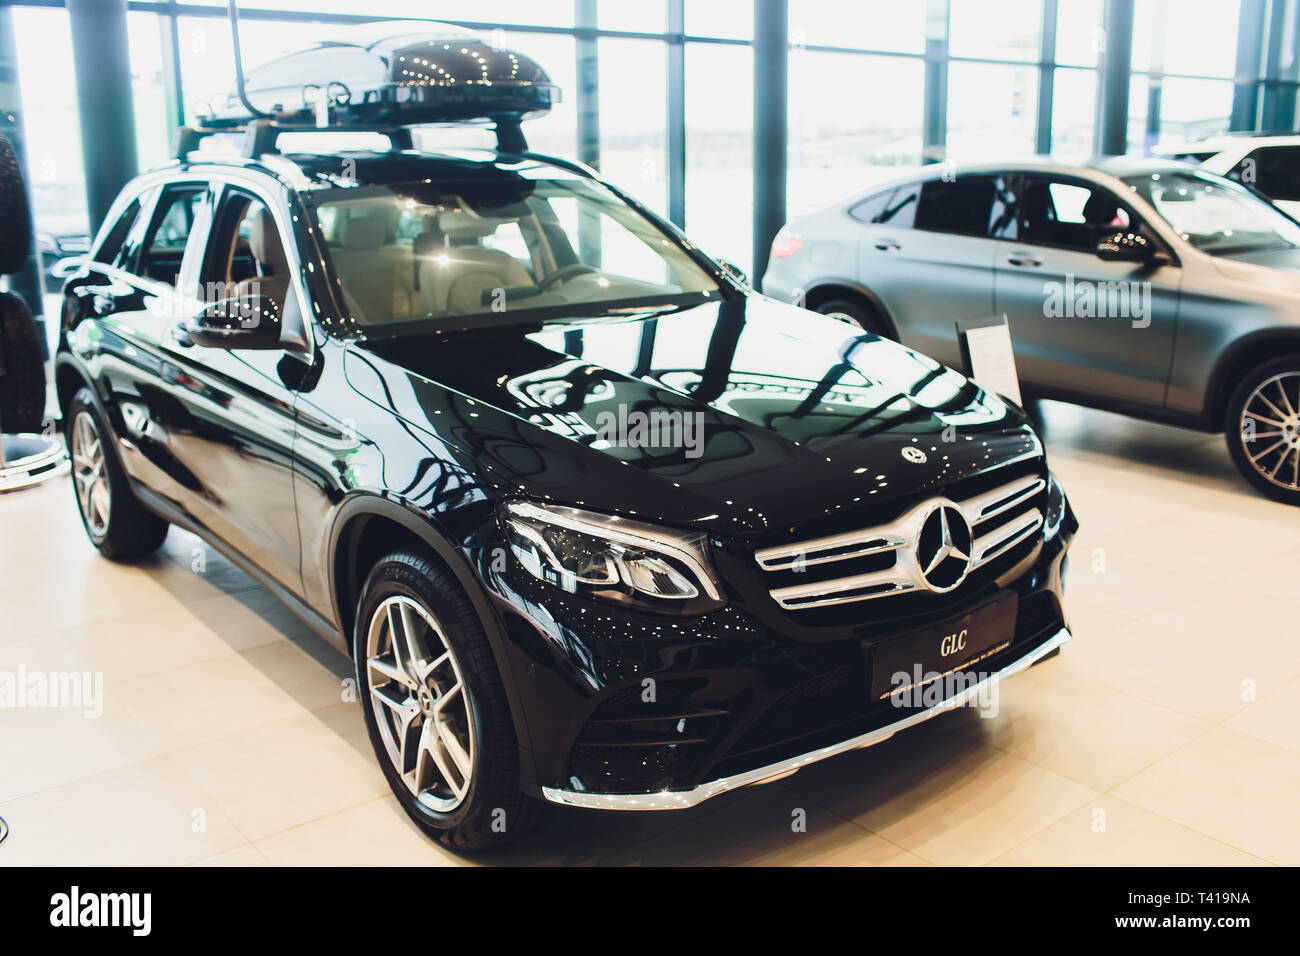 Ufa, Russia - December 23, 2018: Metallic black Mercedes Benz GLC 250d 4Matic. - Stock Image